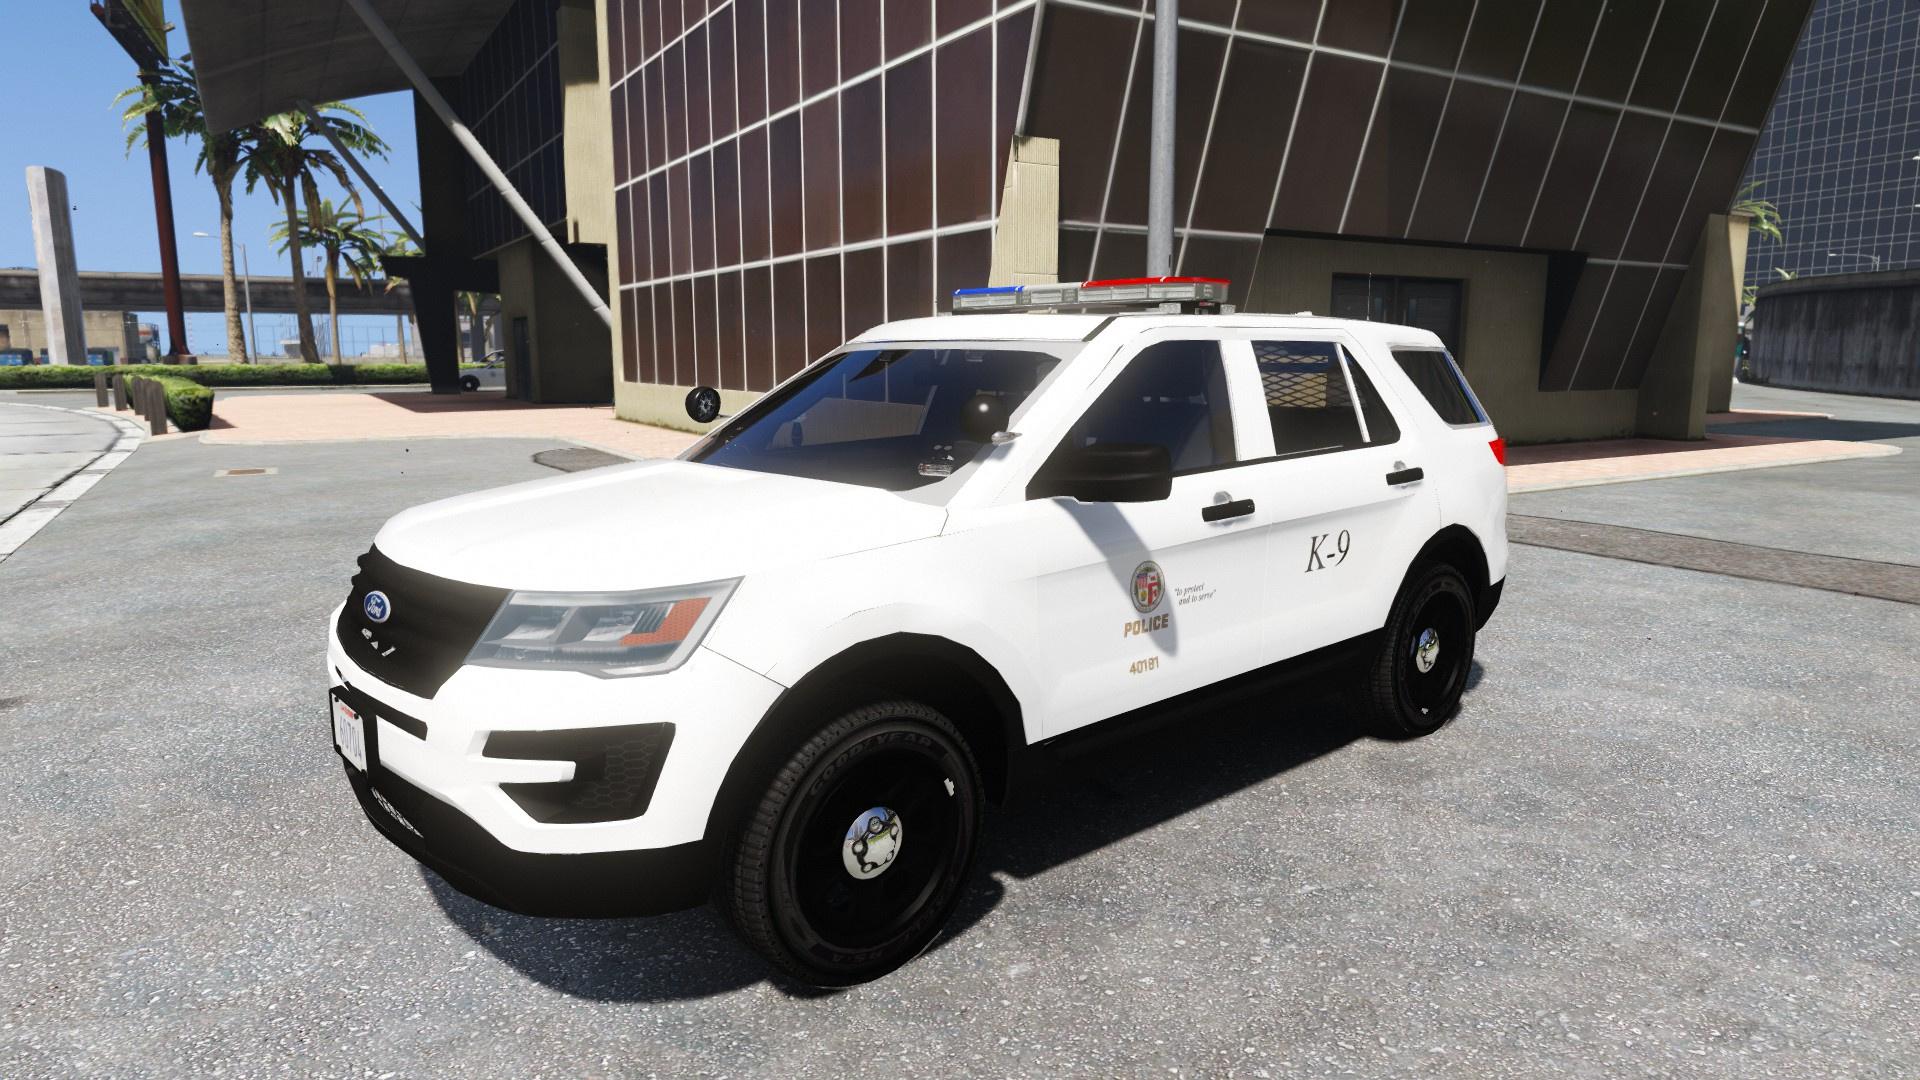 Los Angeles Police Department Lapd Texture Pack 4k Gta5 Mods Com